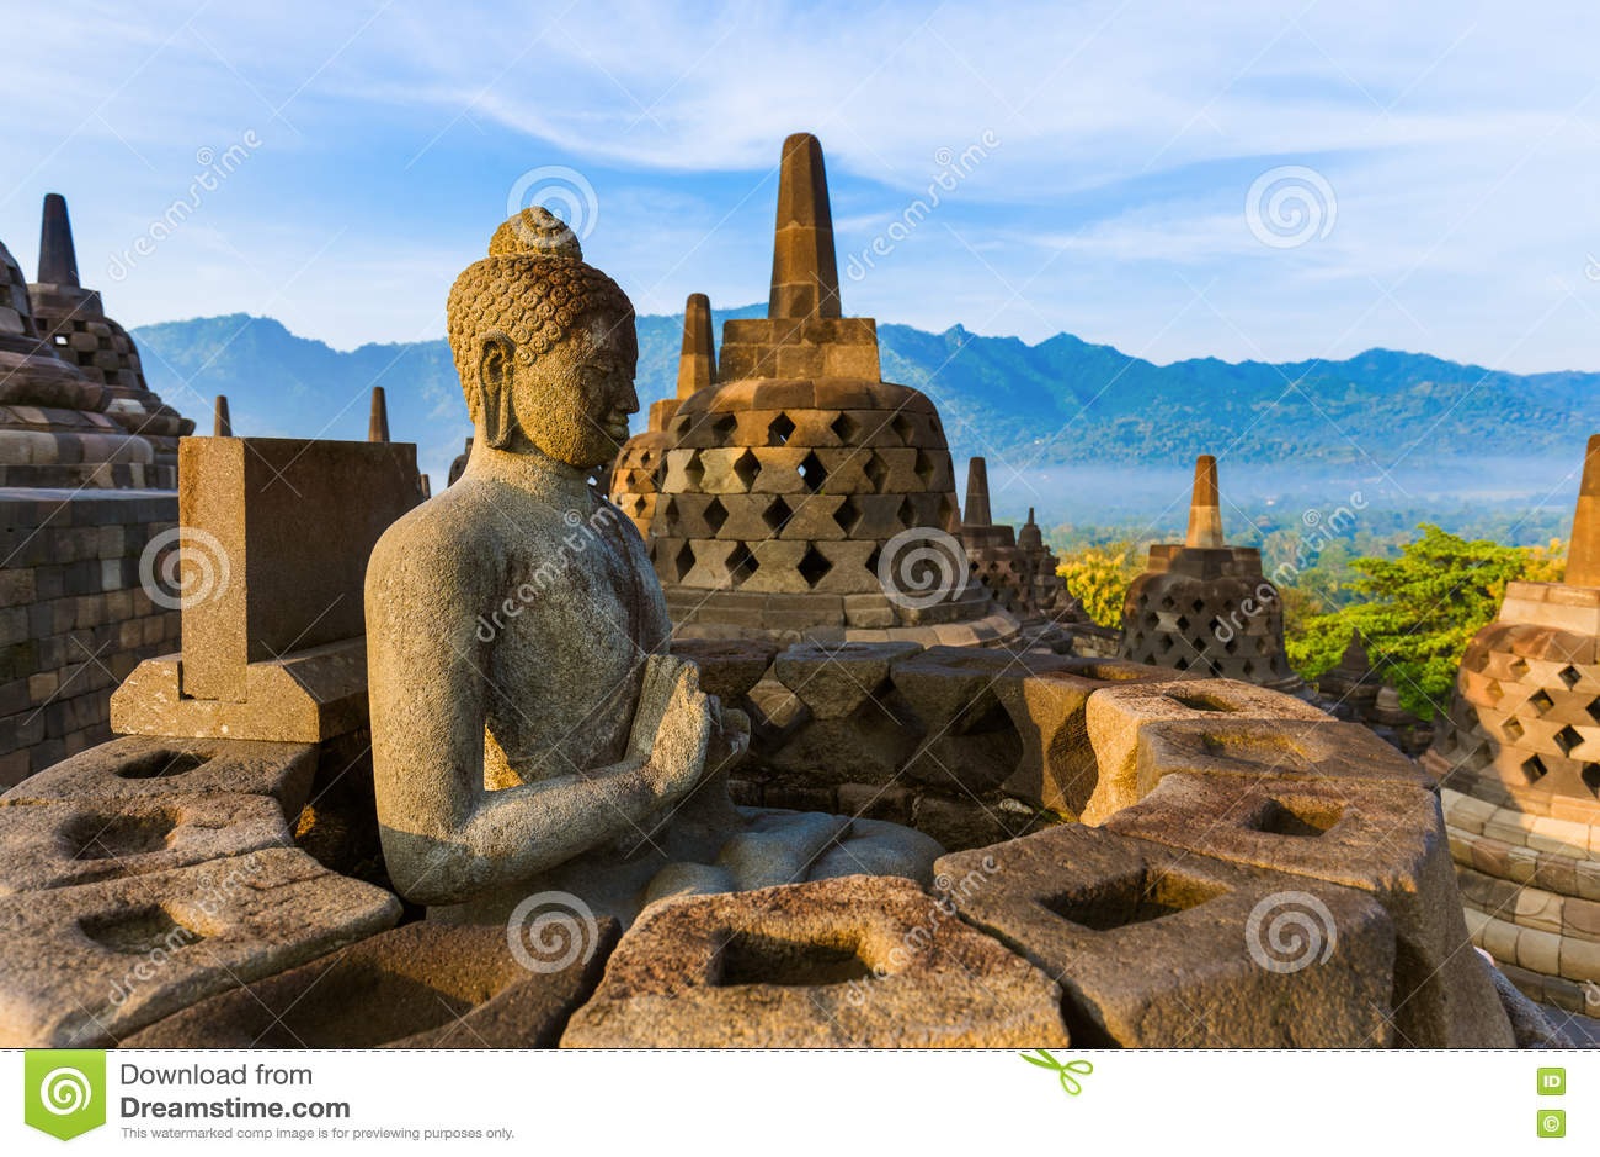 Templo de Borobudur Buddist - isla Java Indonesia